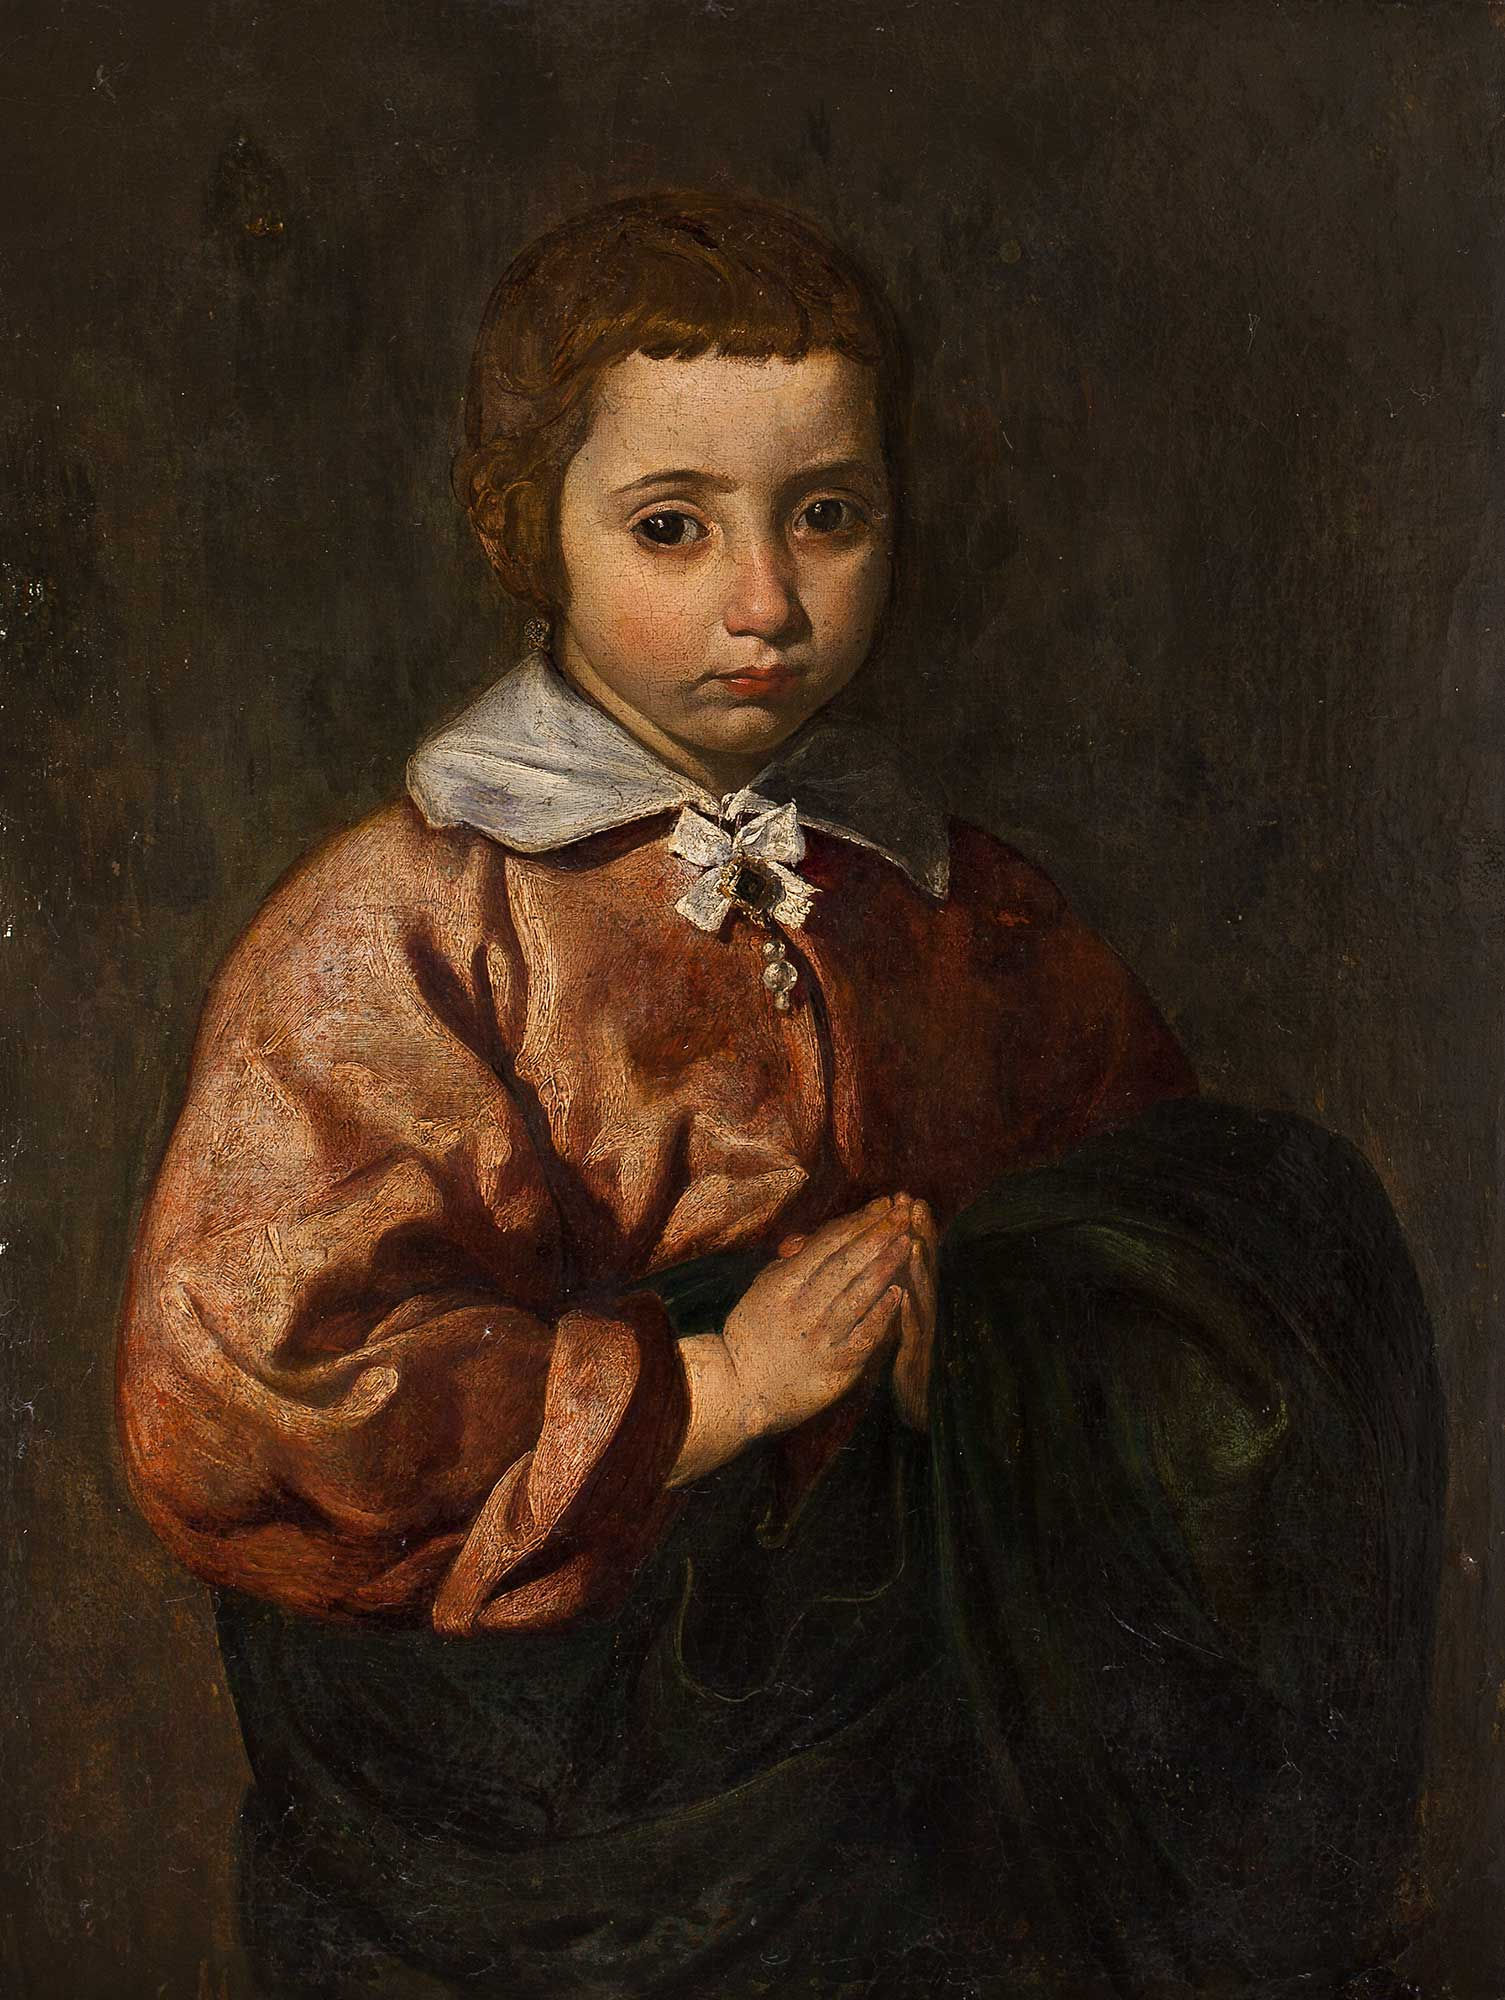 Diego-Velazquez-Retrato-de-nina-o-Joven-Inmaculada